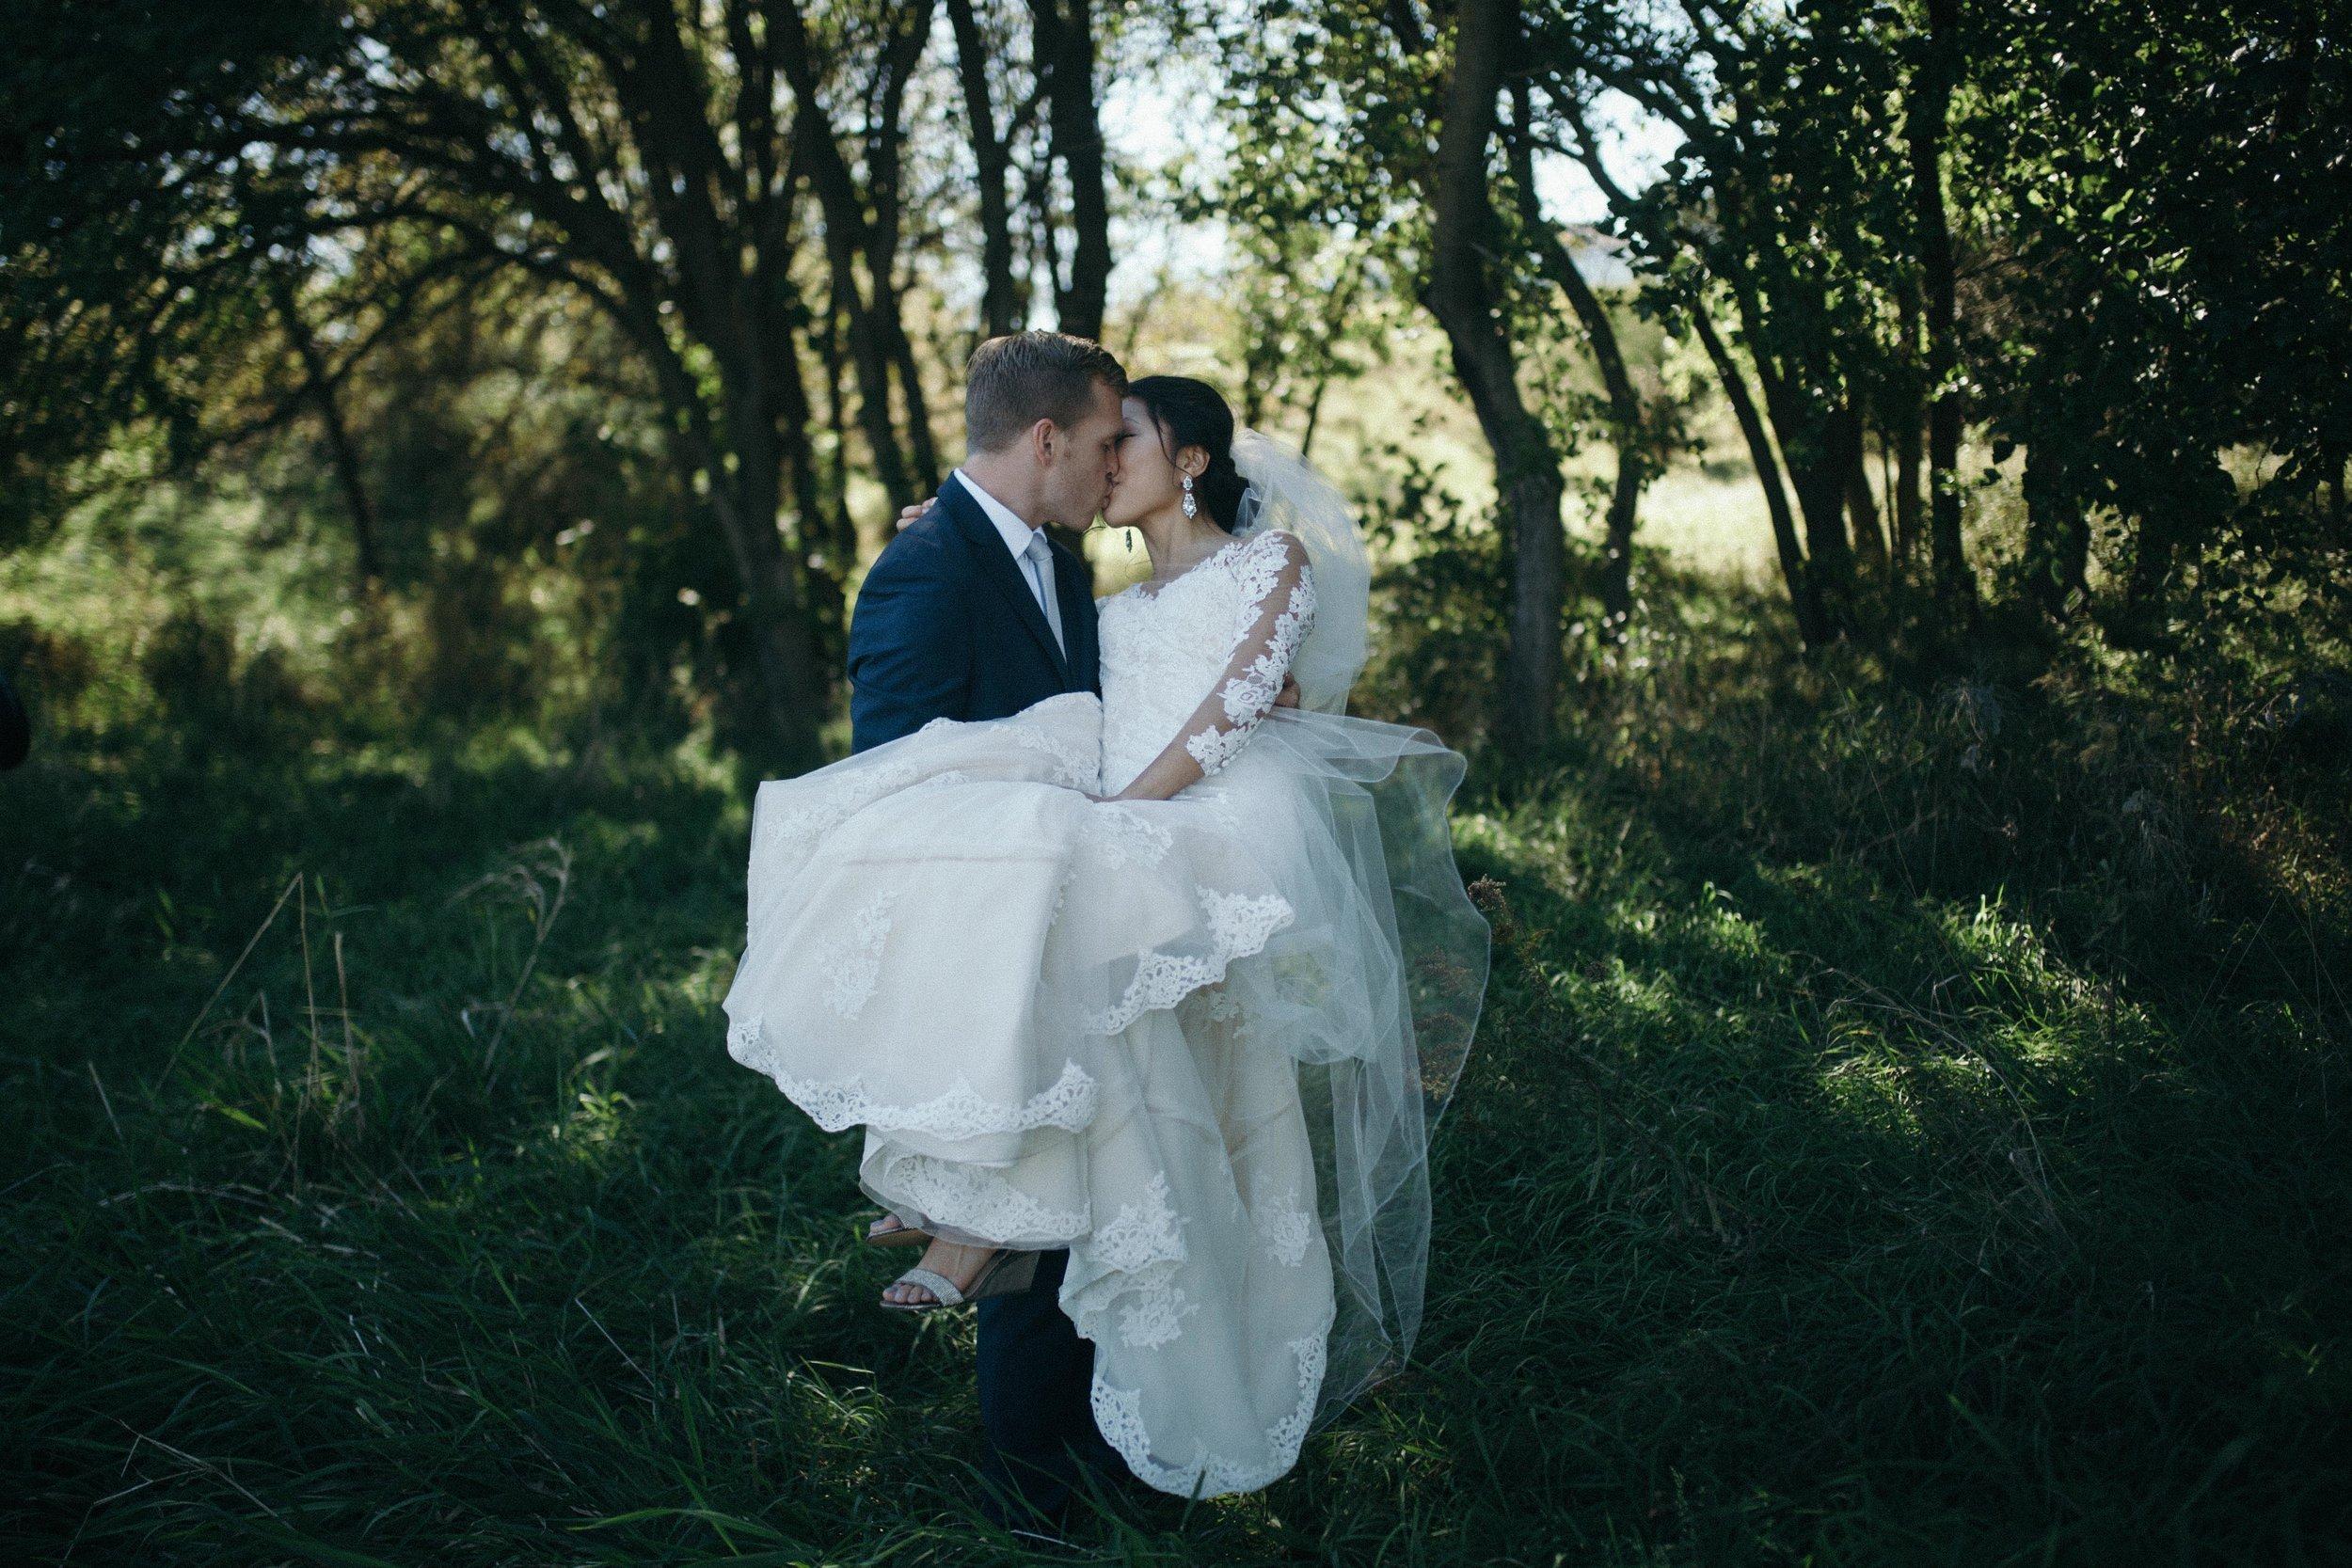 bailey-jared-wedding-blog-28.jpg